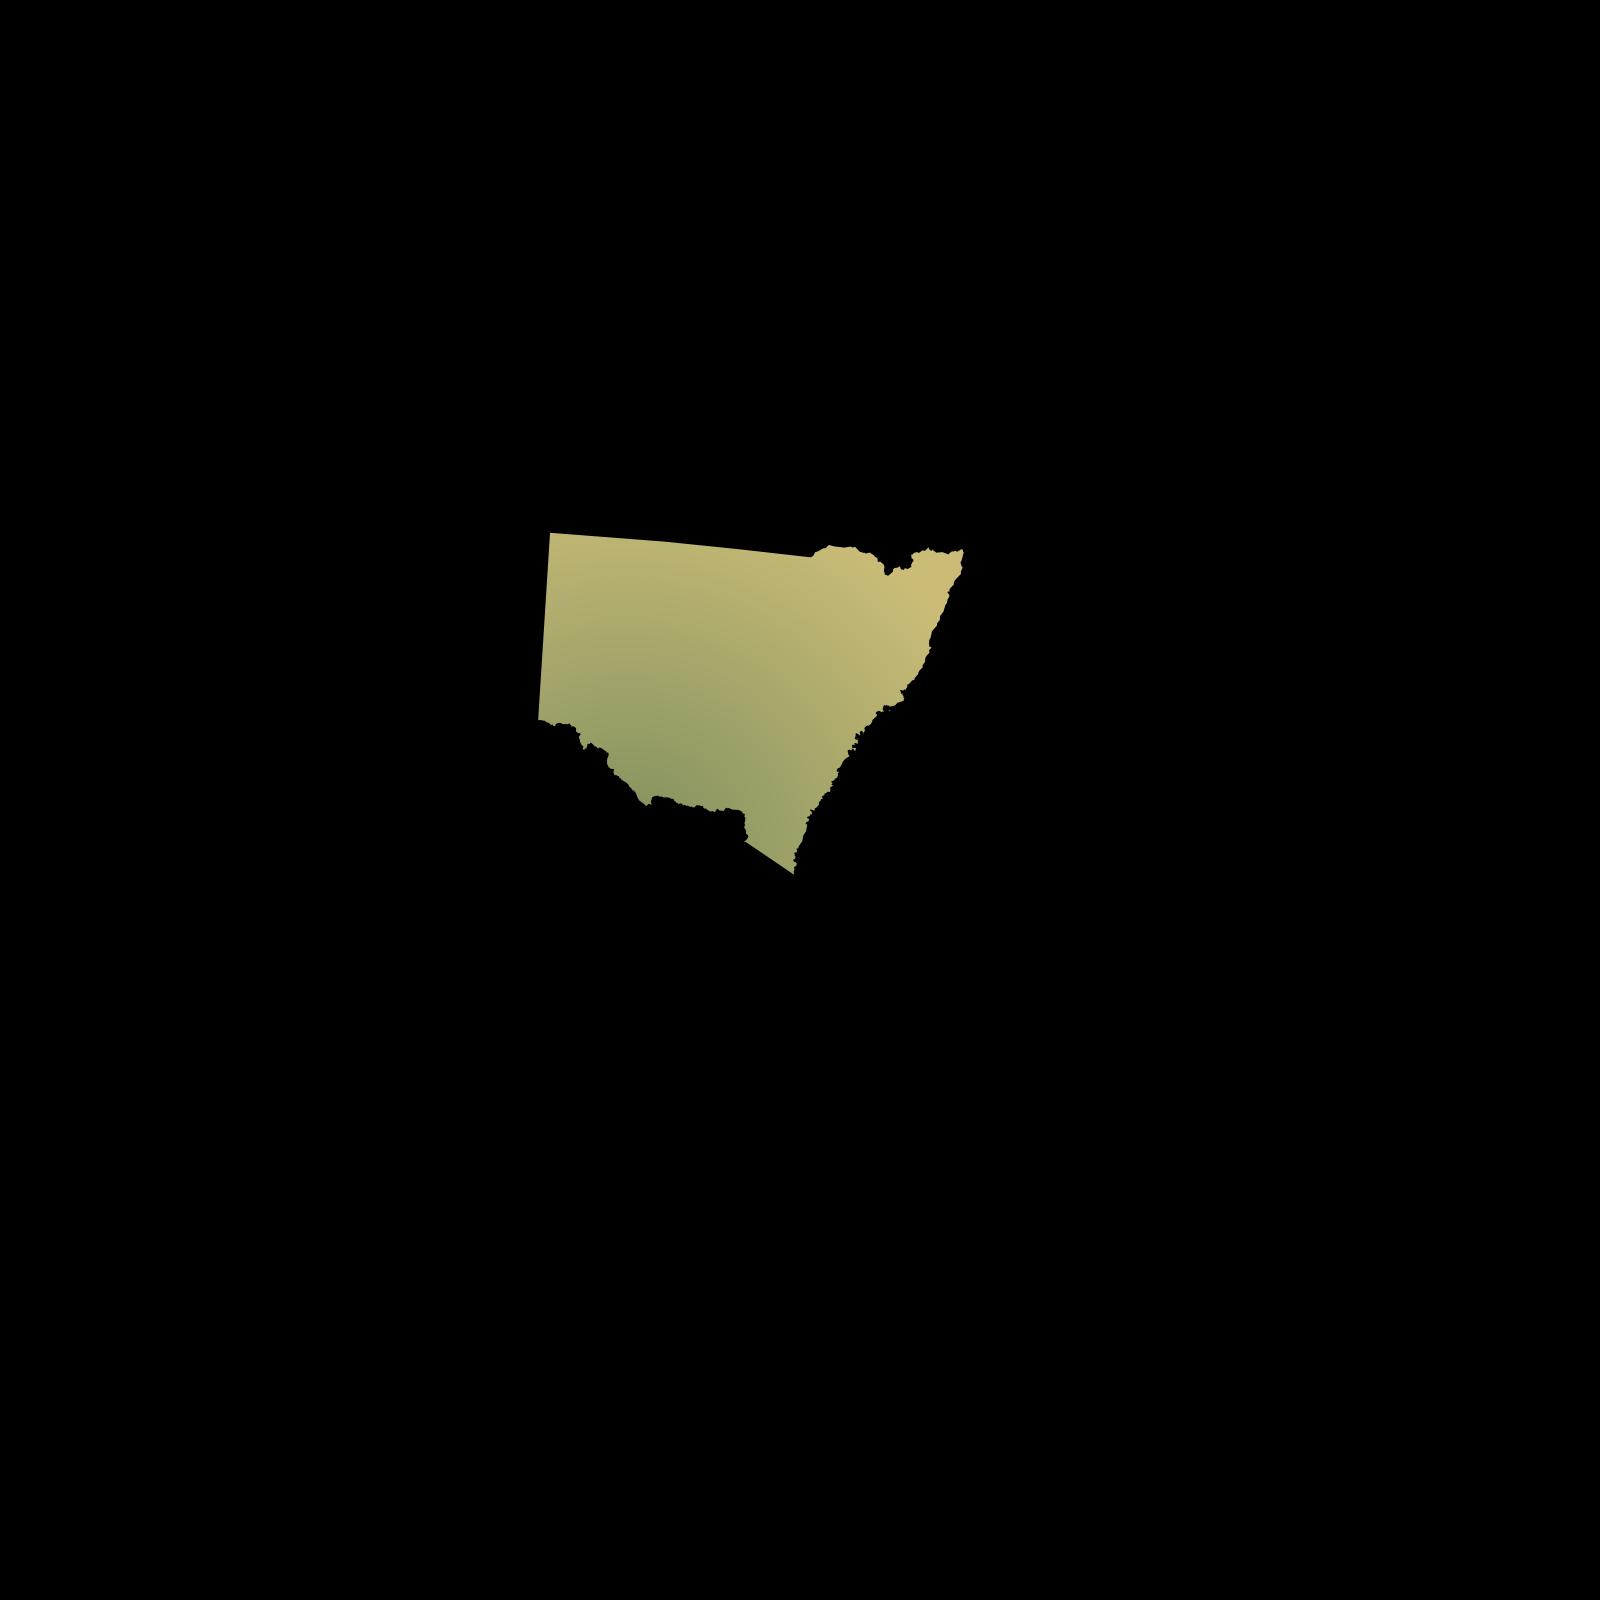 Australia Map Svg.Australian Maps Clip Art Icon And Svg Svg Clipart